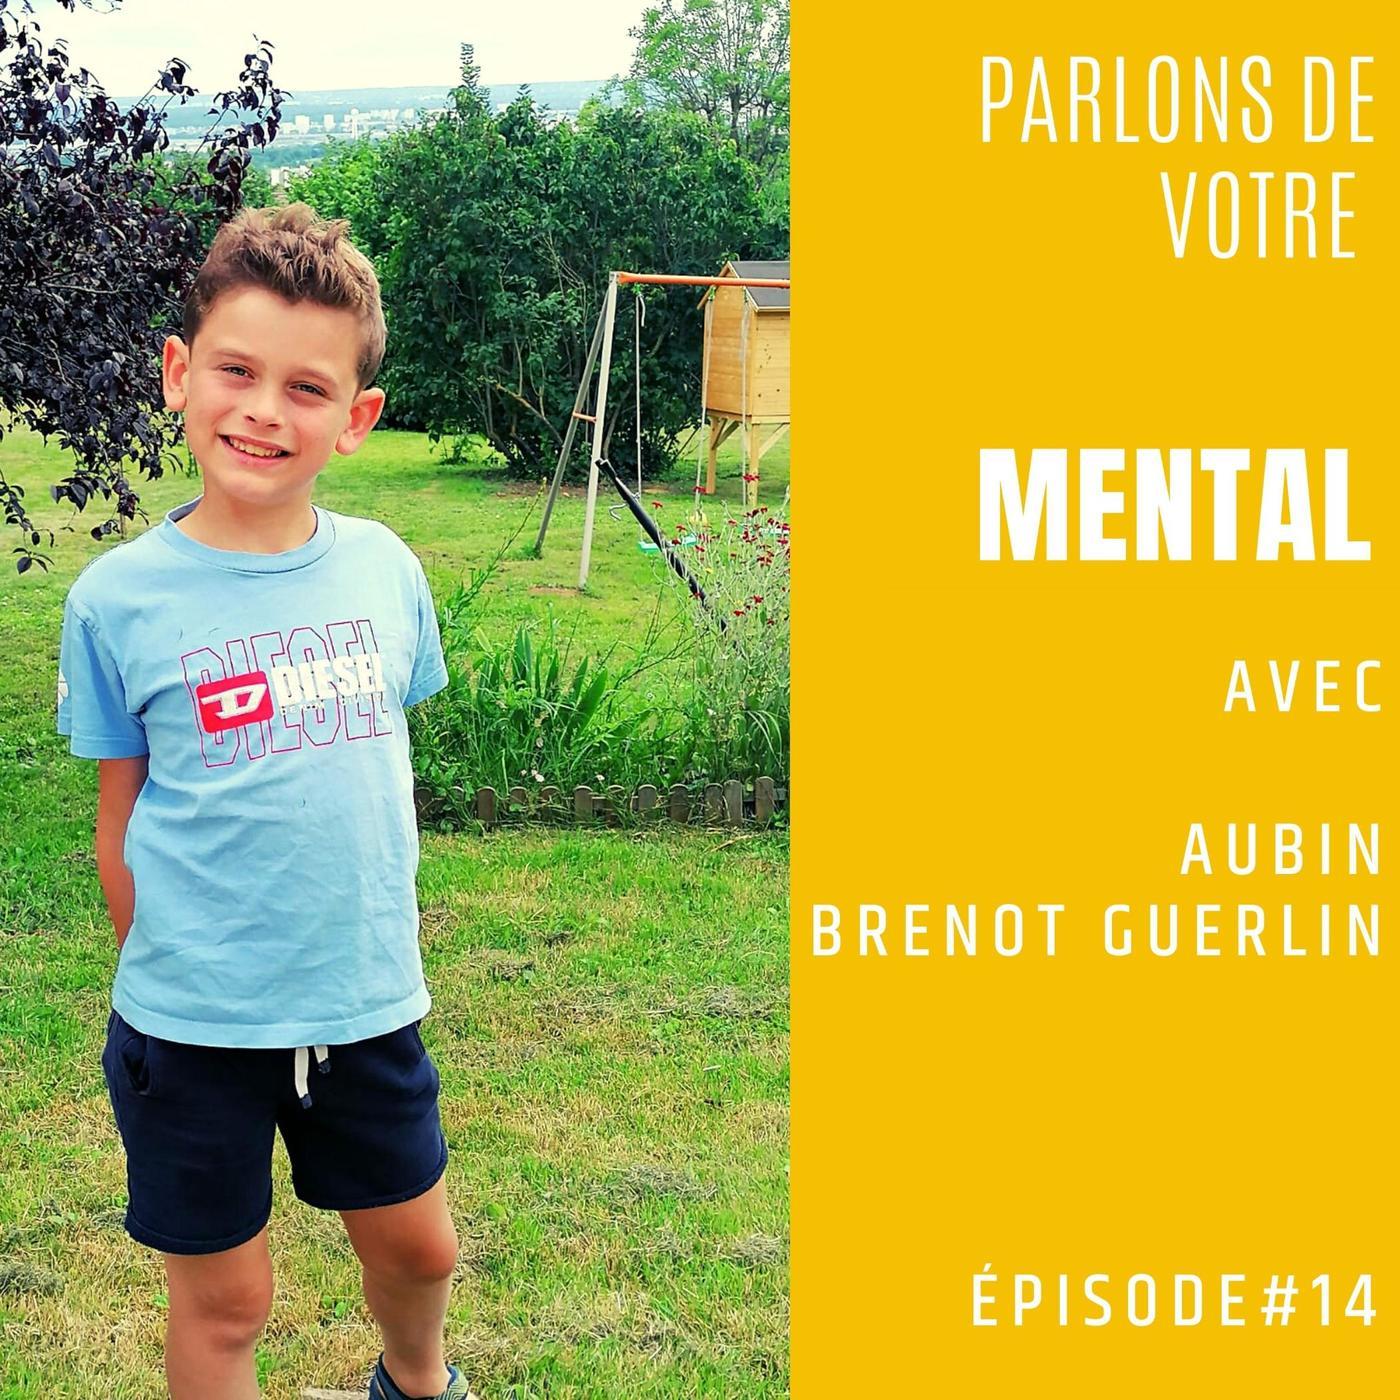 Aubin BRENOT GUERLIN - Ecolier CE2 - Comédien - Judoka